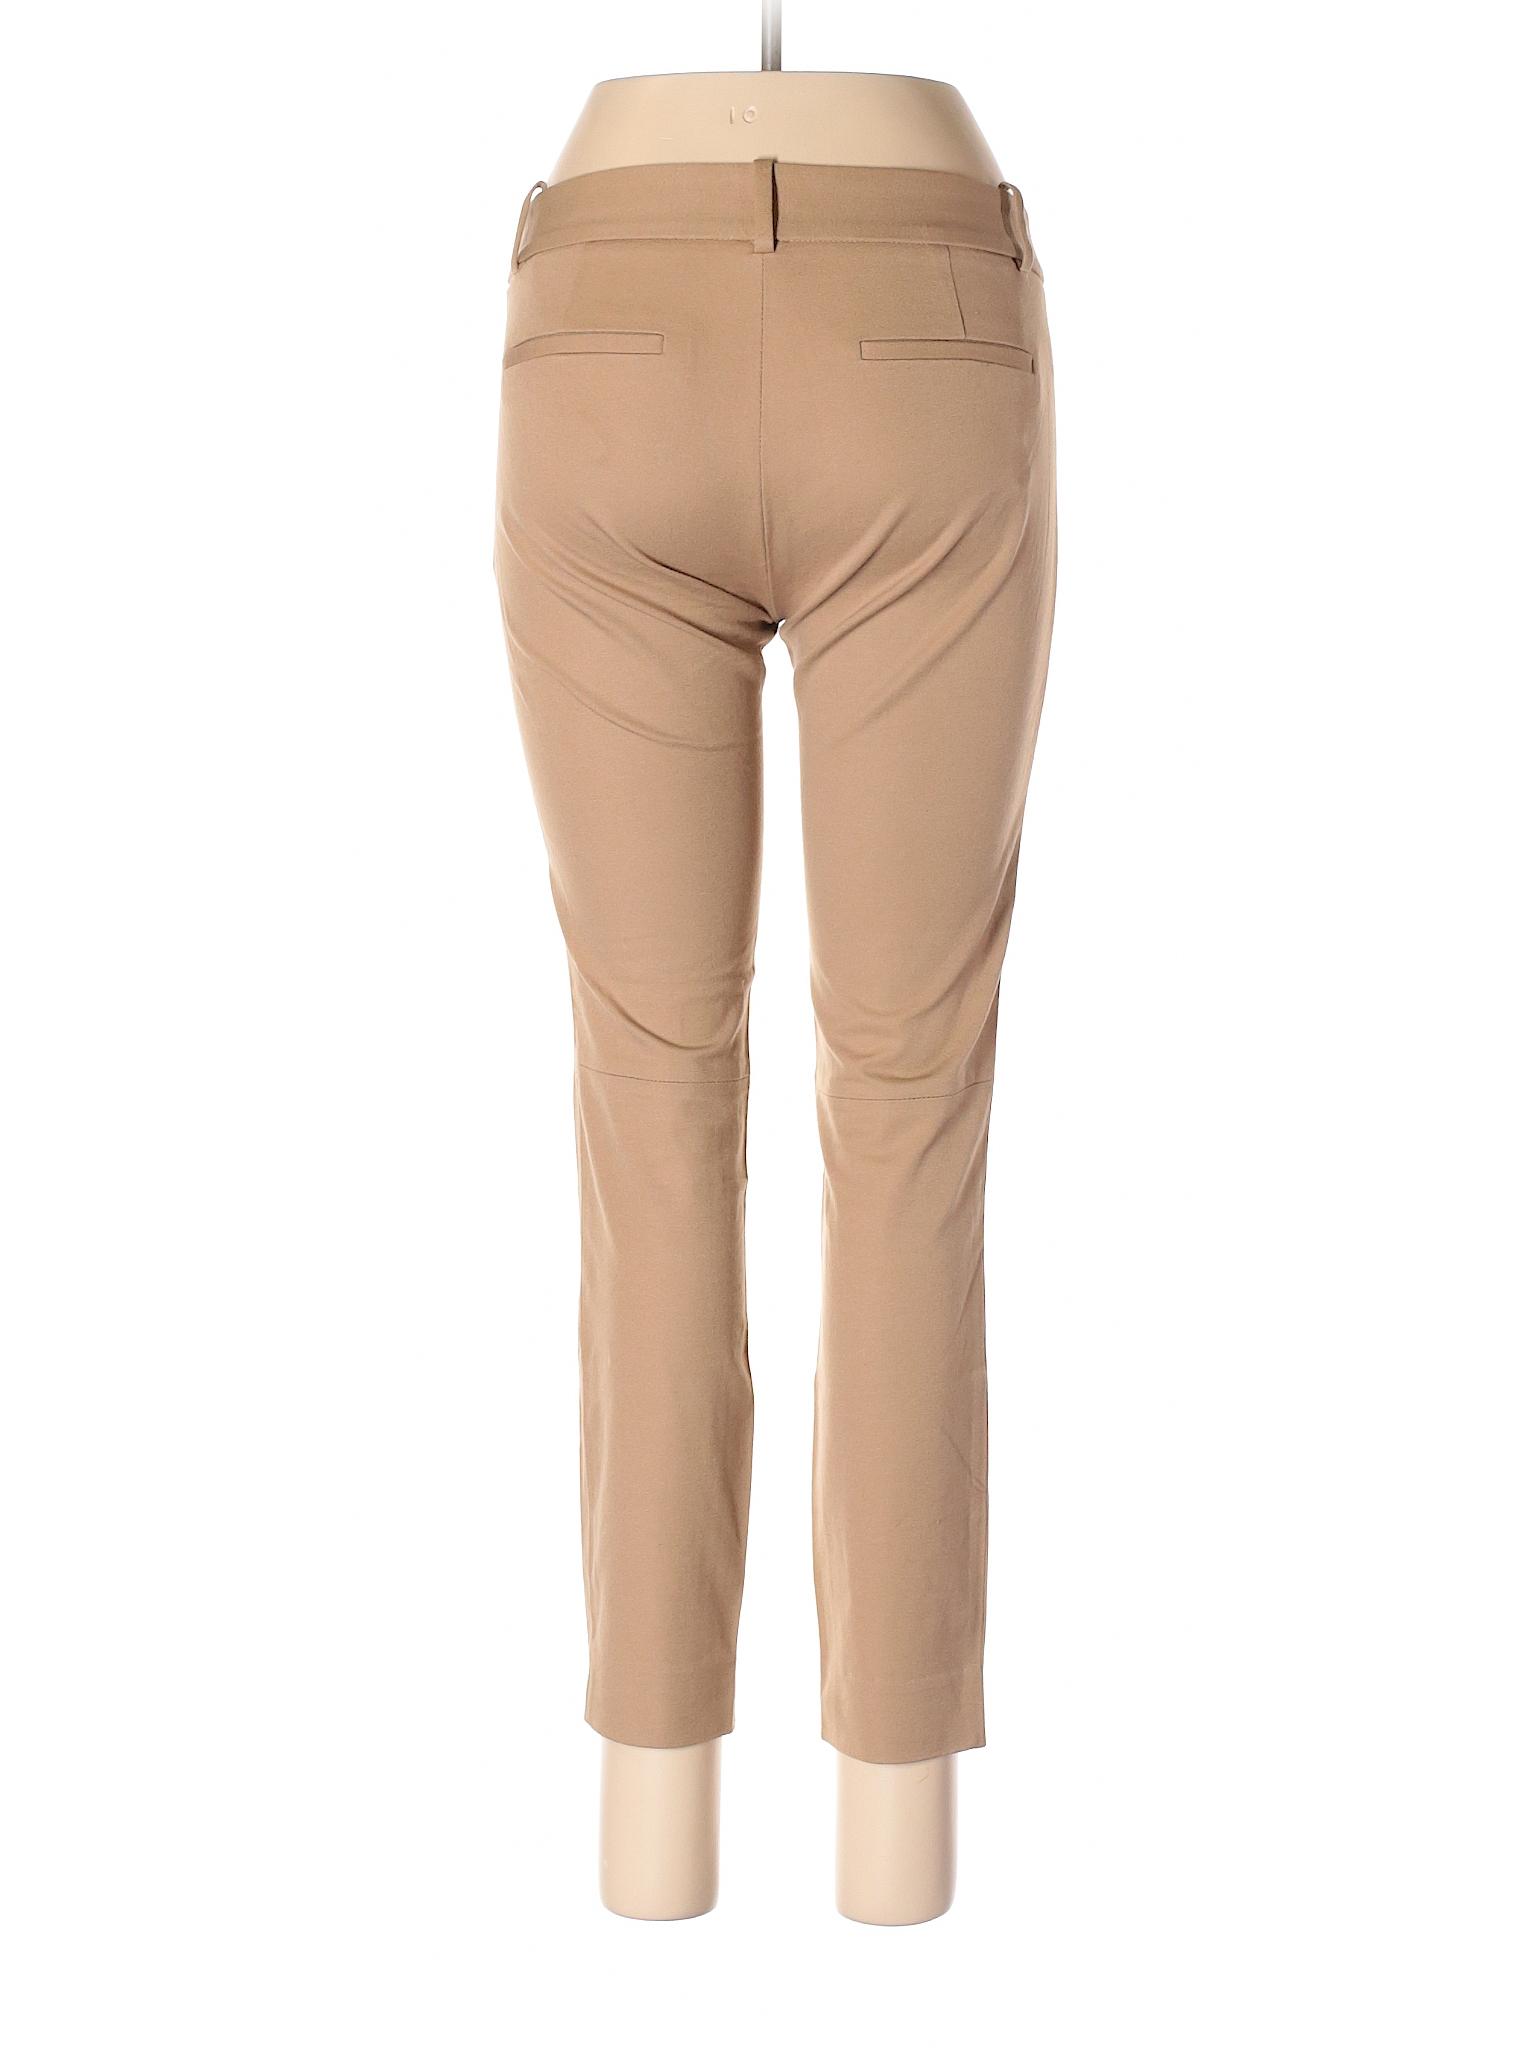 Boutique Dress winter Pants J Crew WYgrRTYq